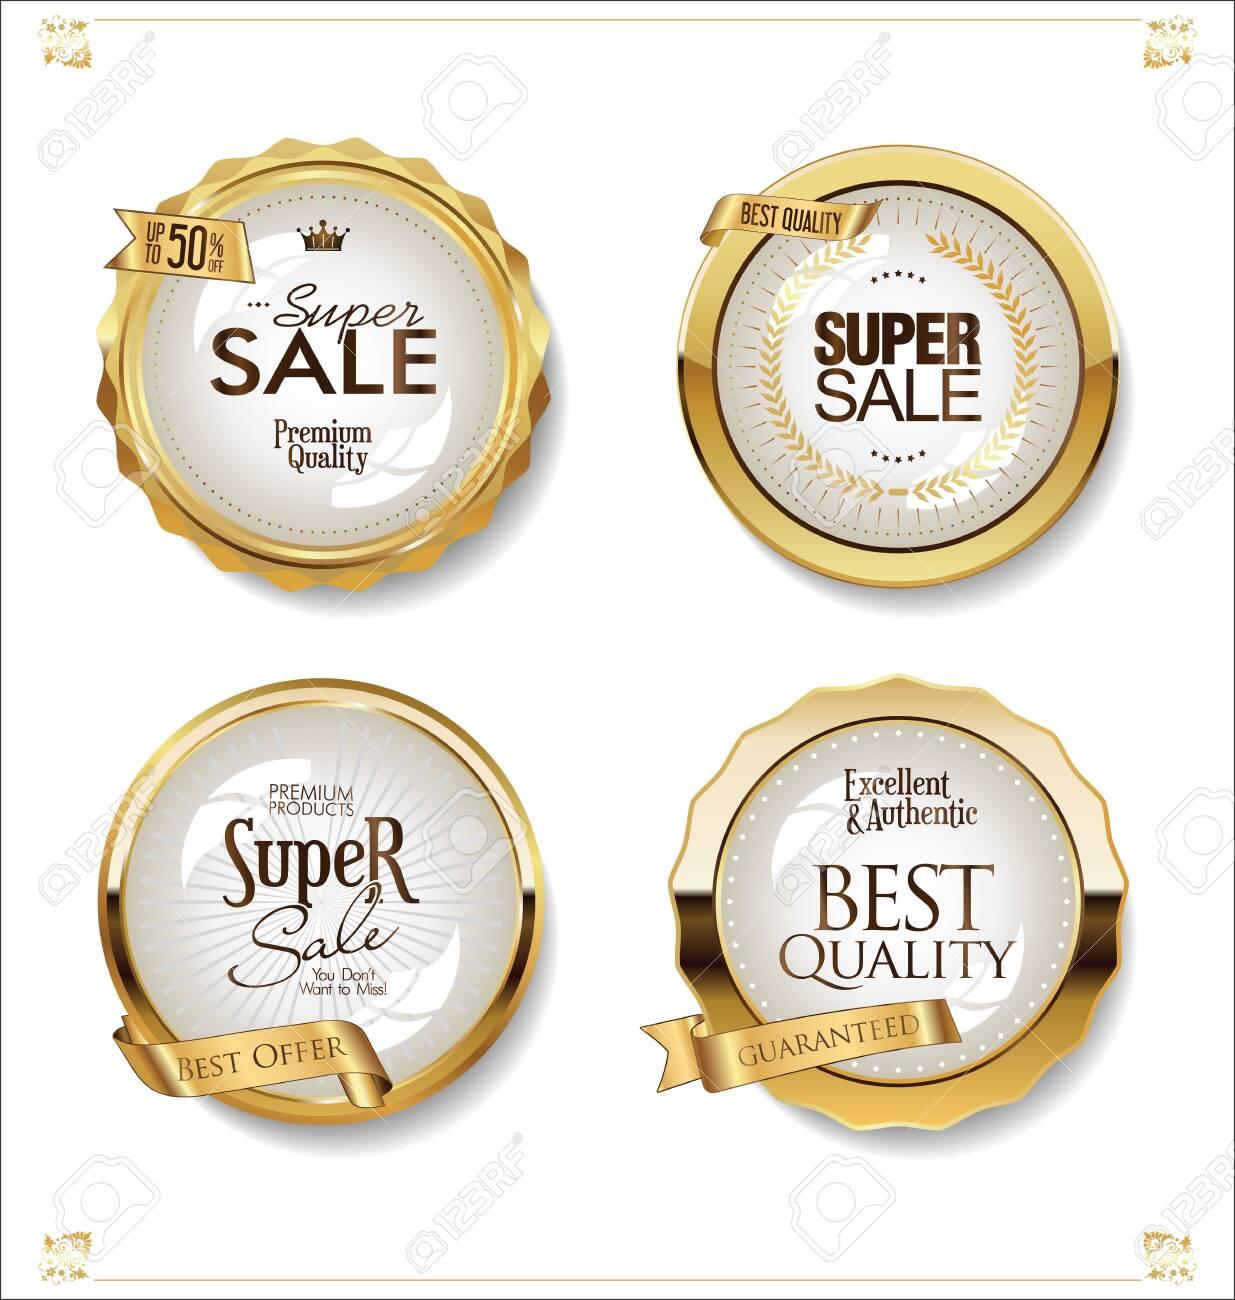 Luxury premium golden badges and labels - 121670117